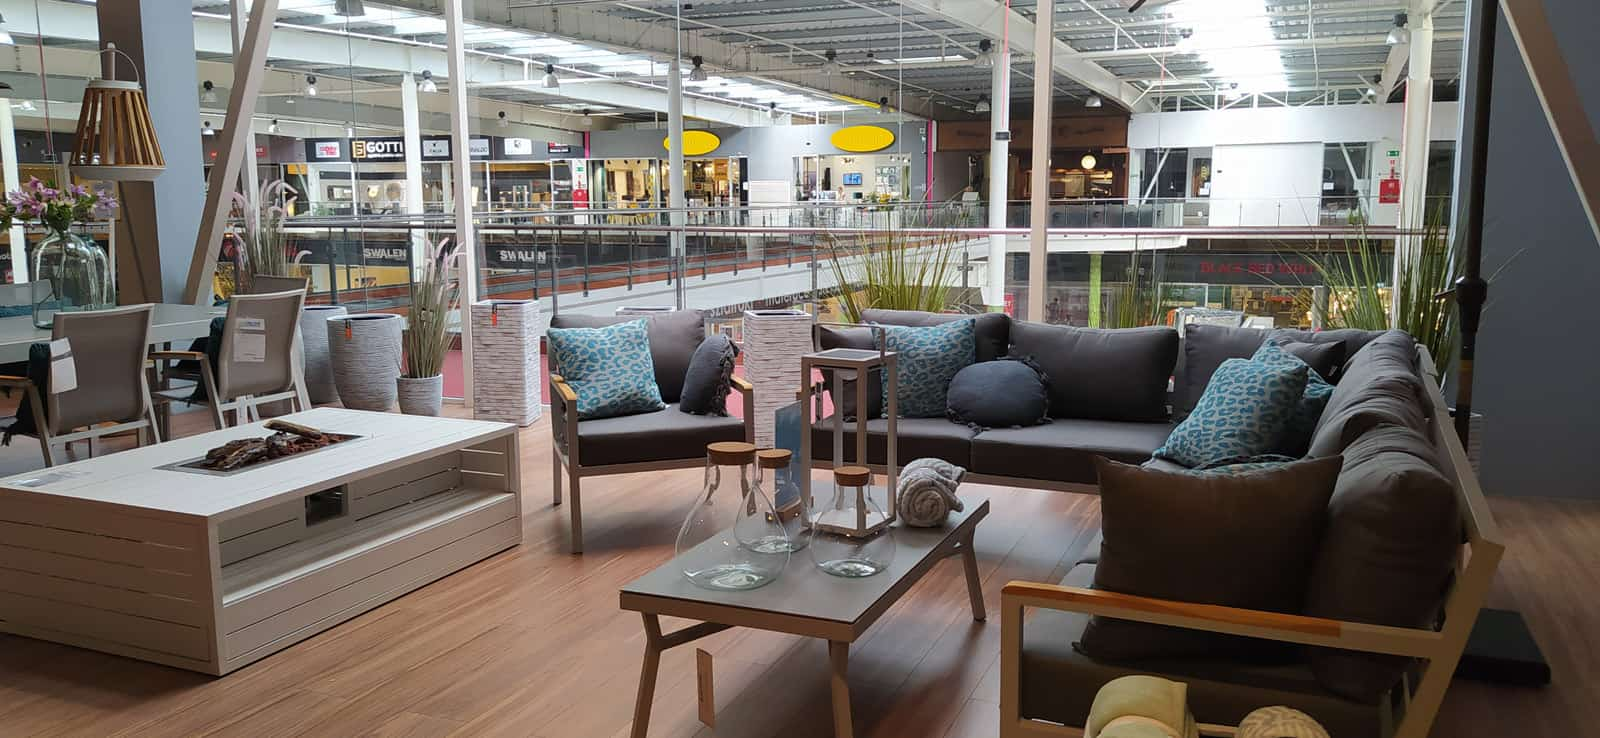 Meble ogrodowe Szczecin (Top Shopping)